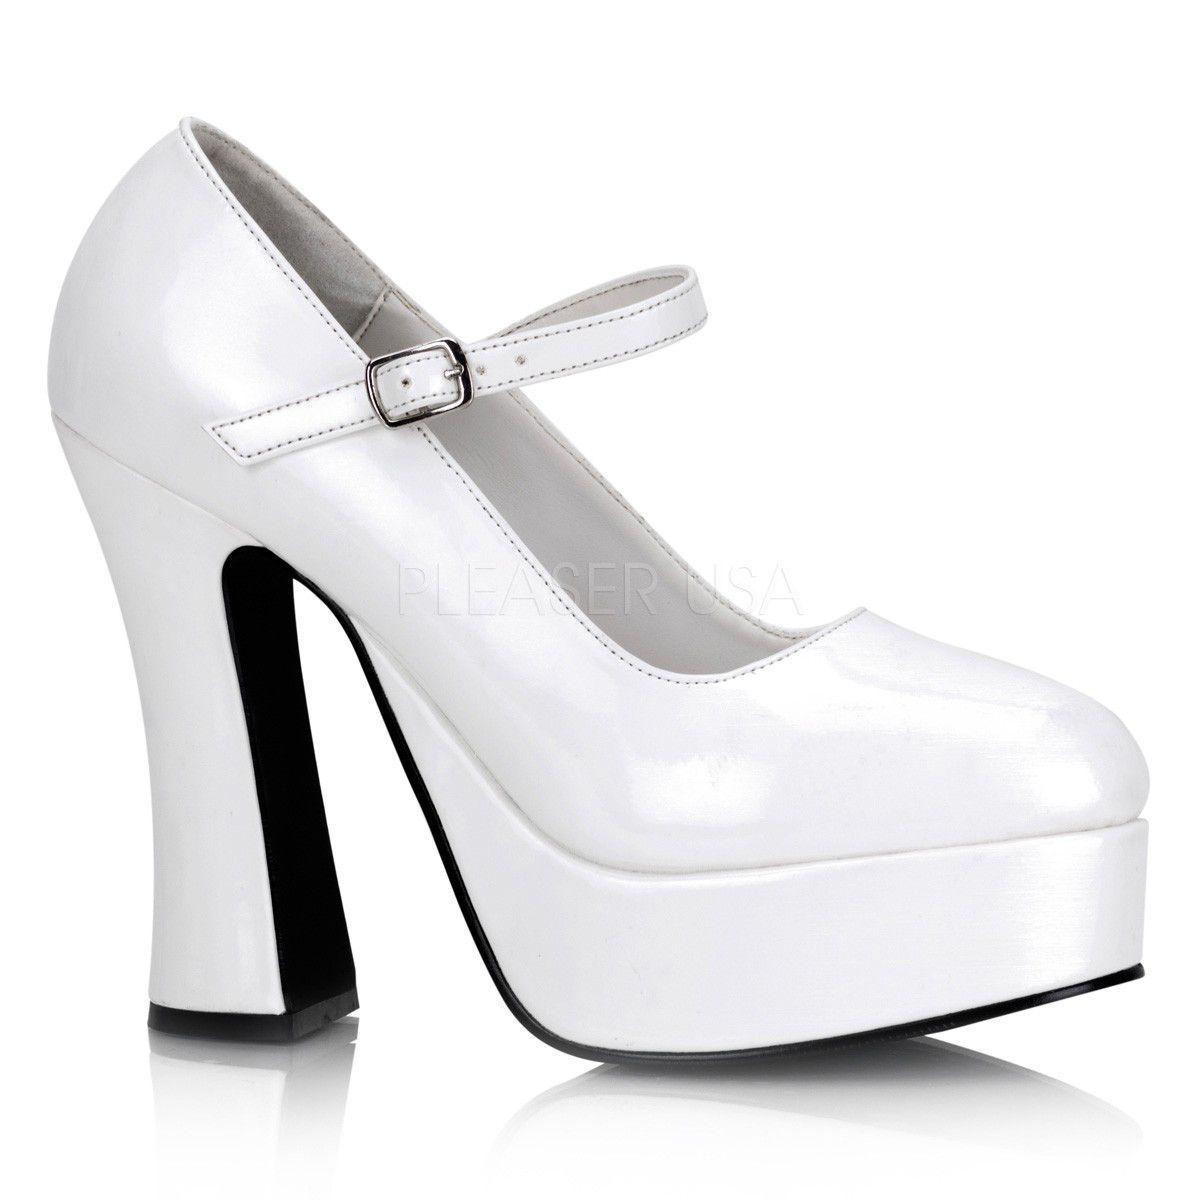 Sapato Dolly 50 - Demonia (encomenda)